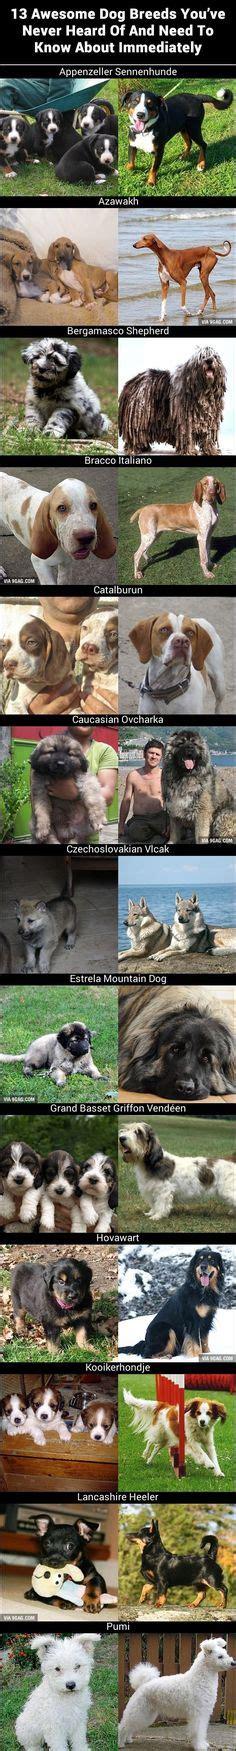 listofdogbreeds helpfully   great infographic